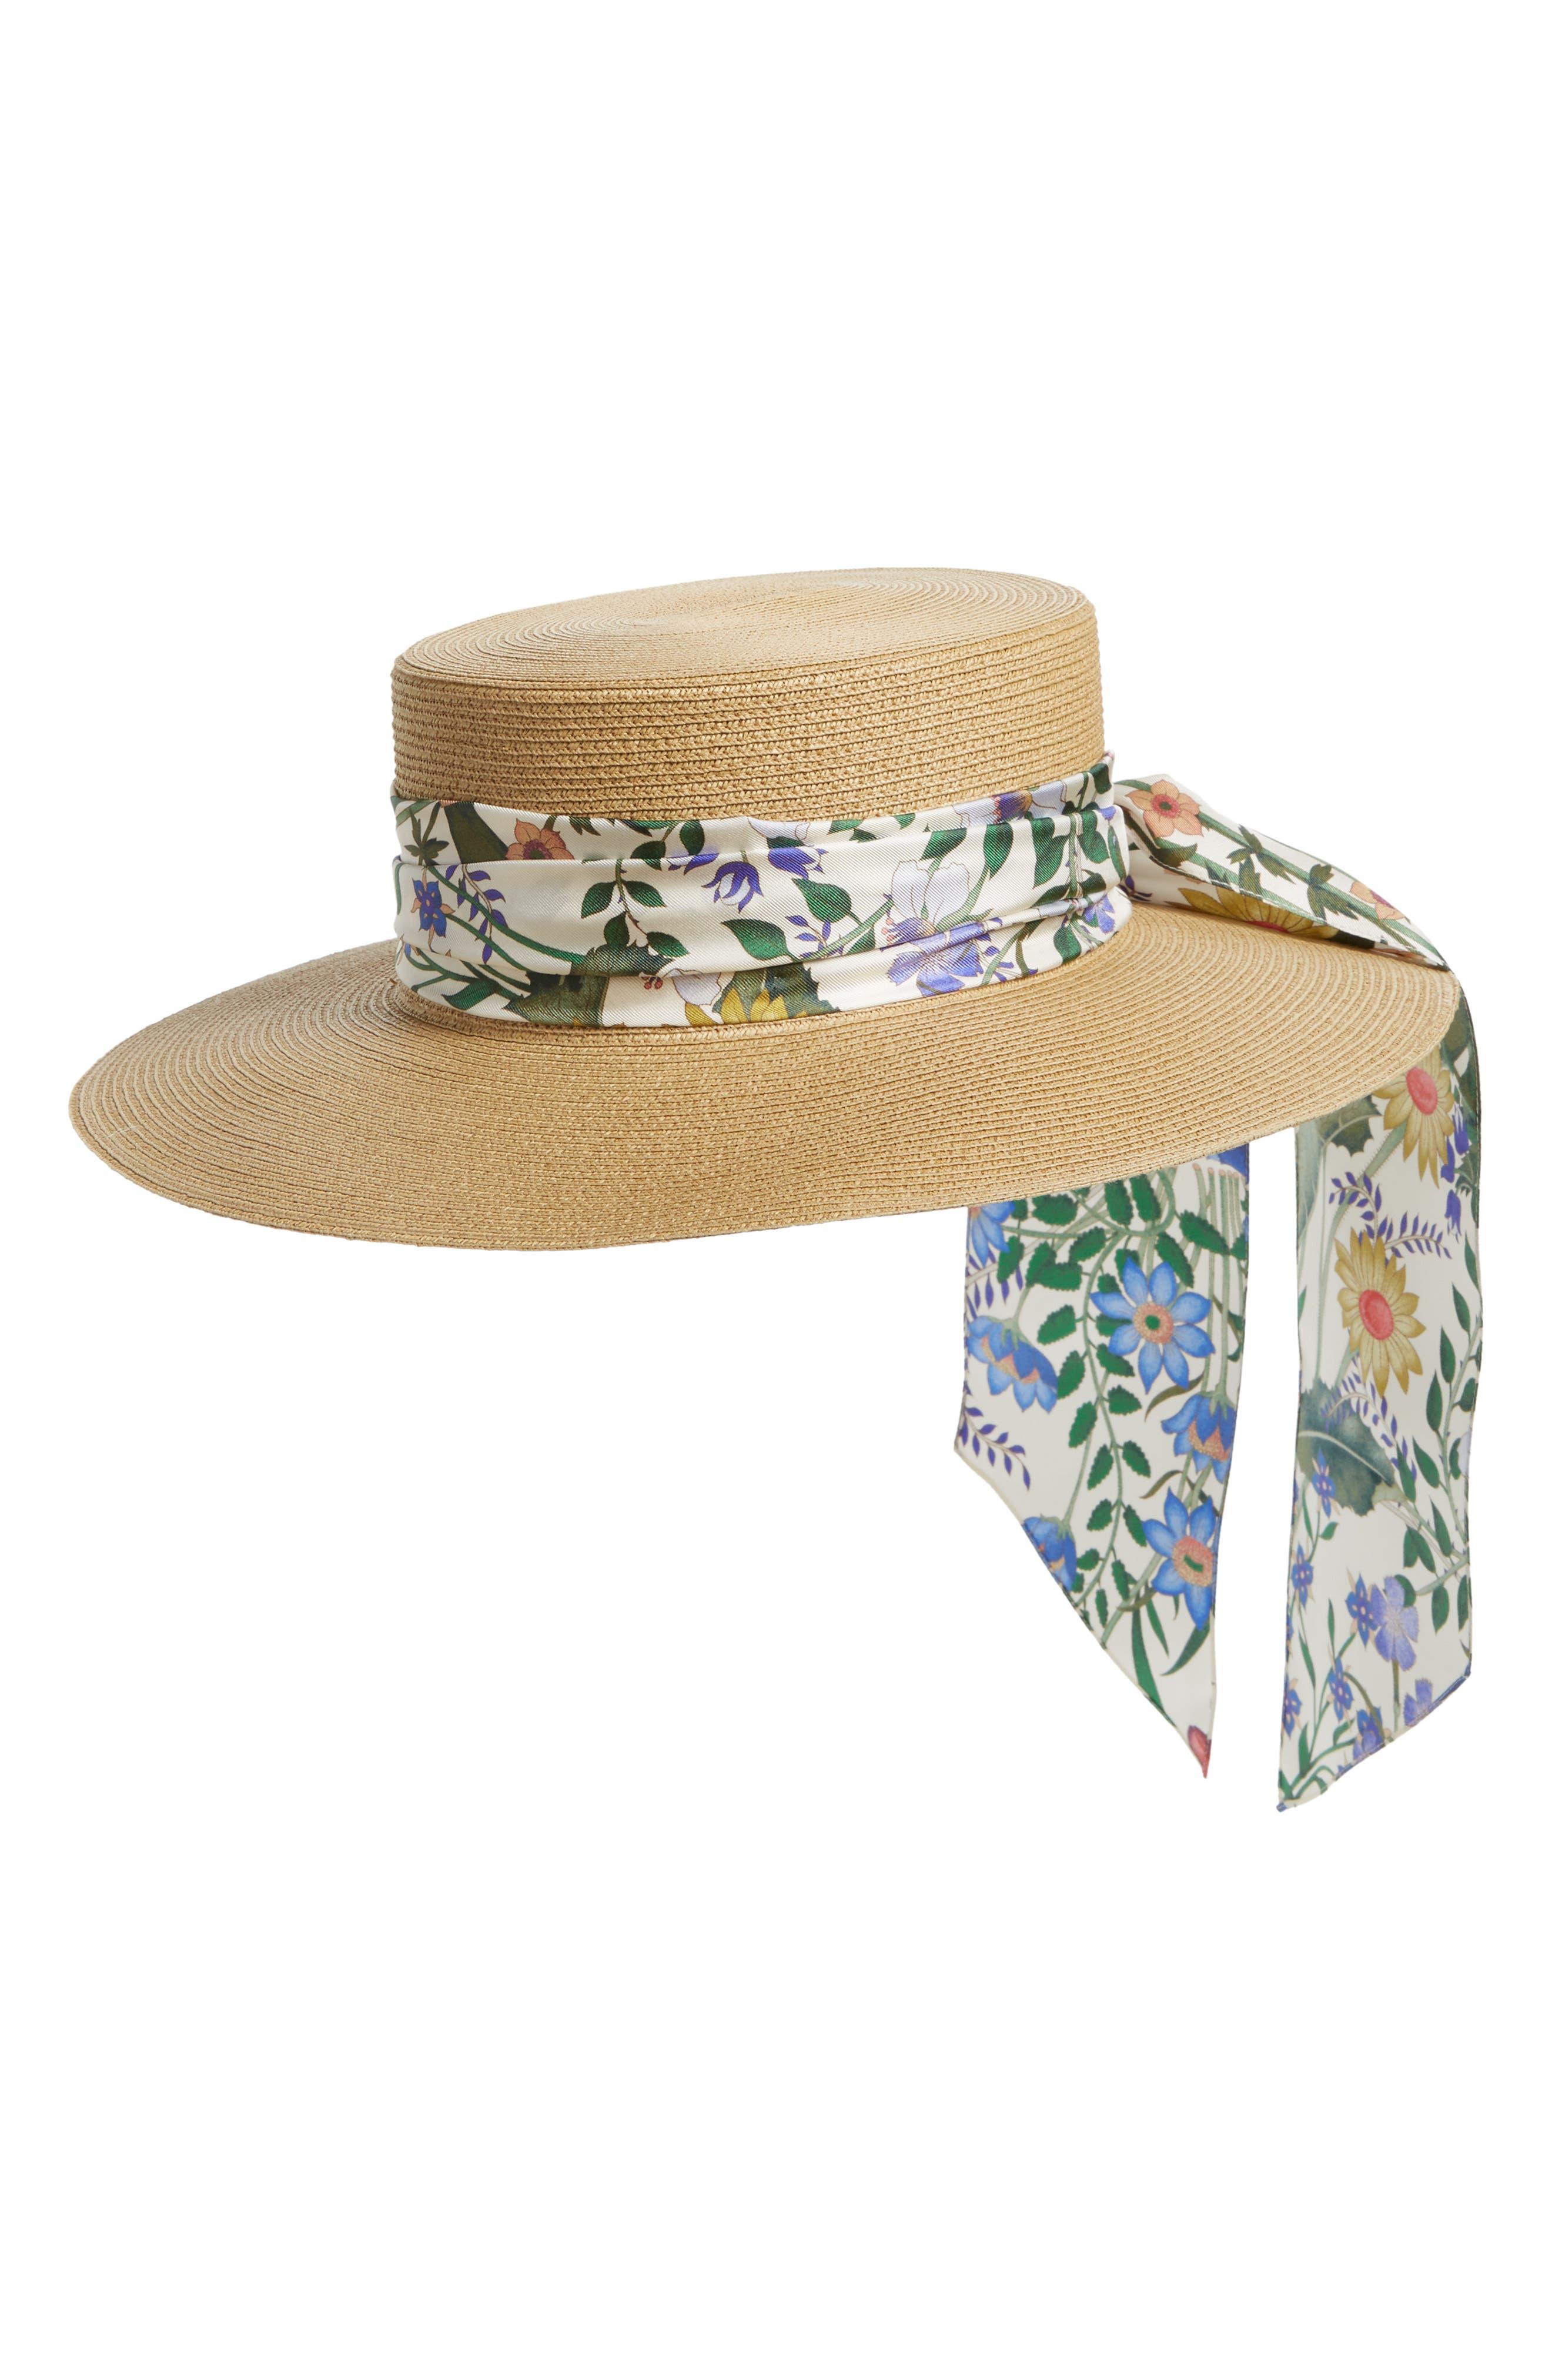 Alba Straw Hat,                         Main,                         color, Rope/ White